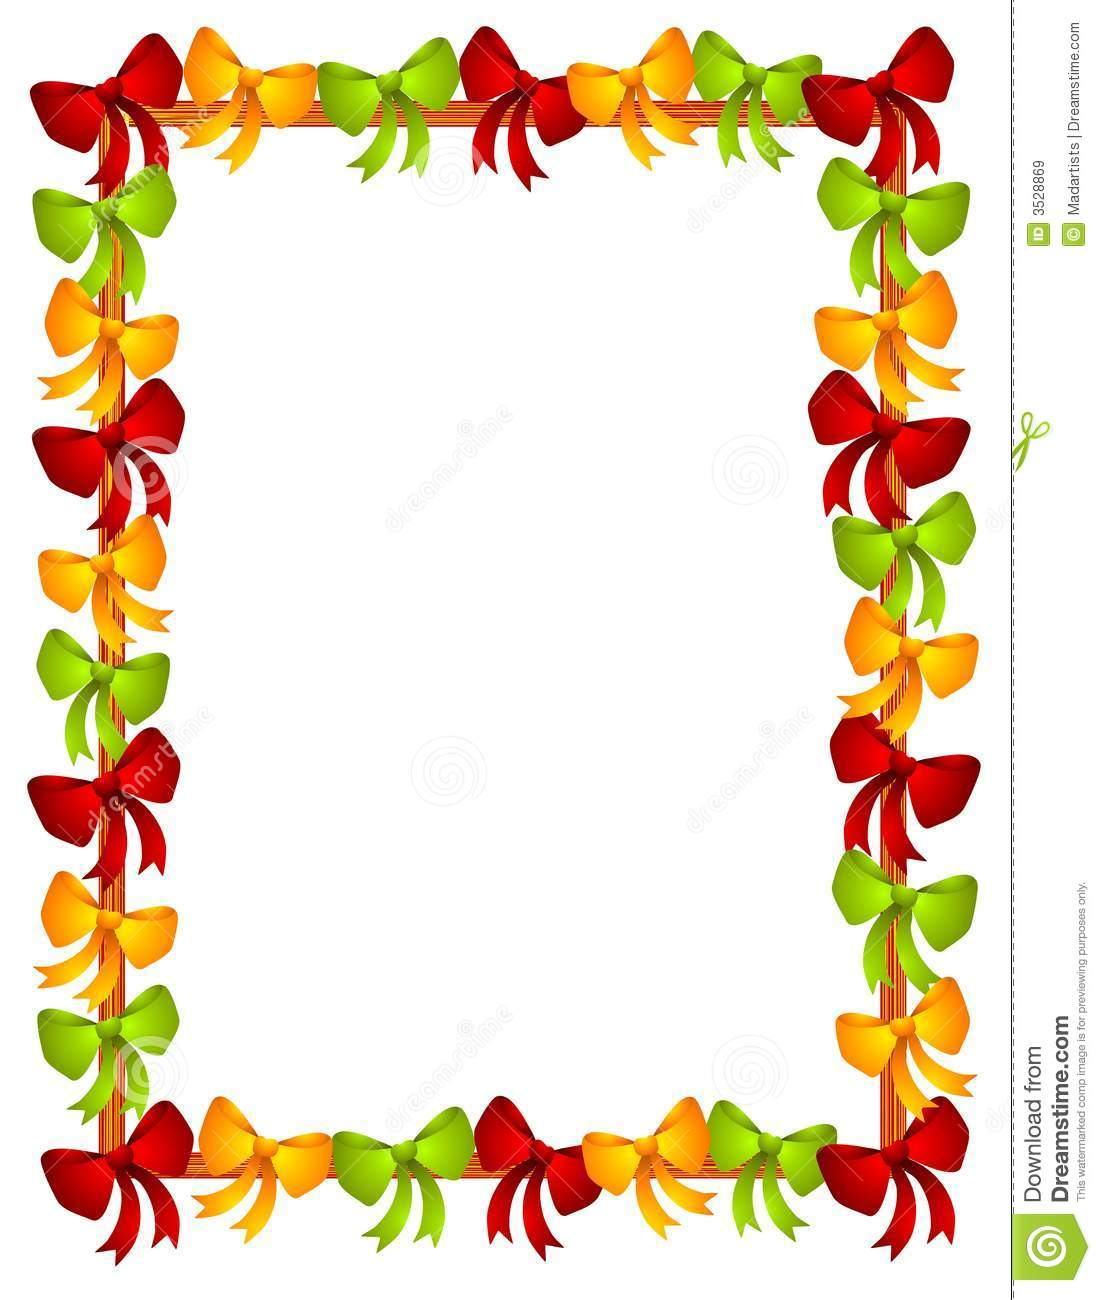 Fruit Border Clipart - Clipart Kid